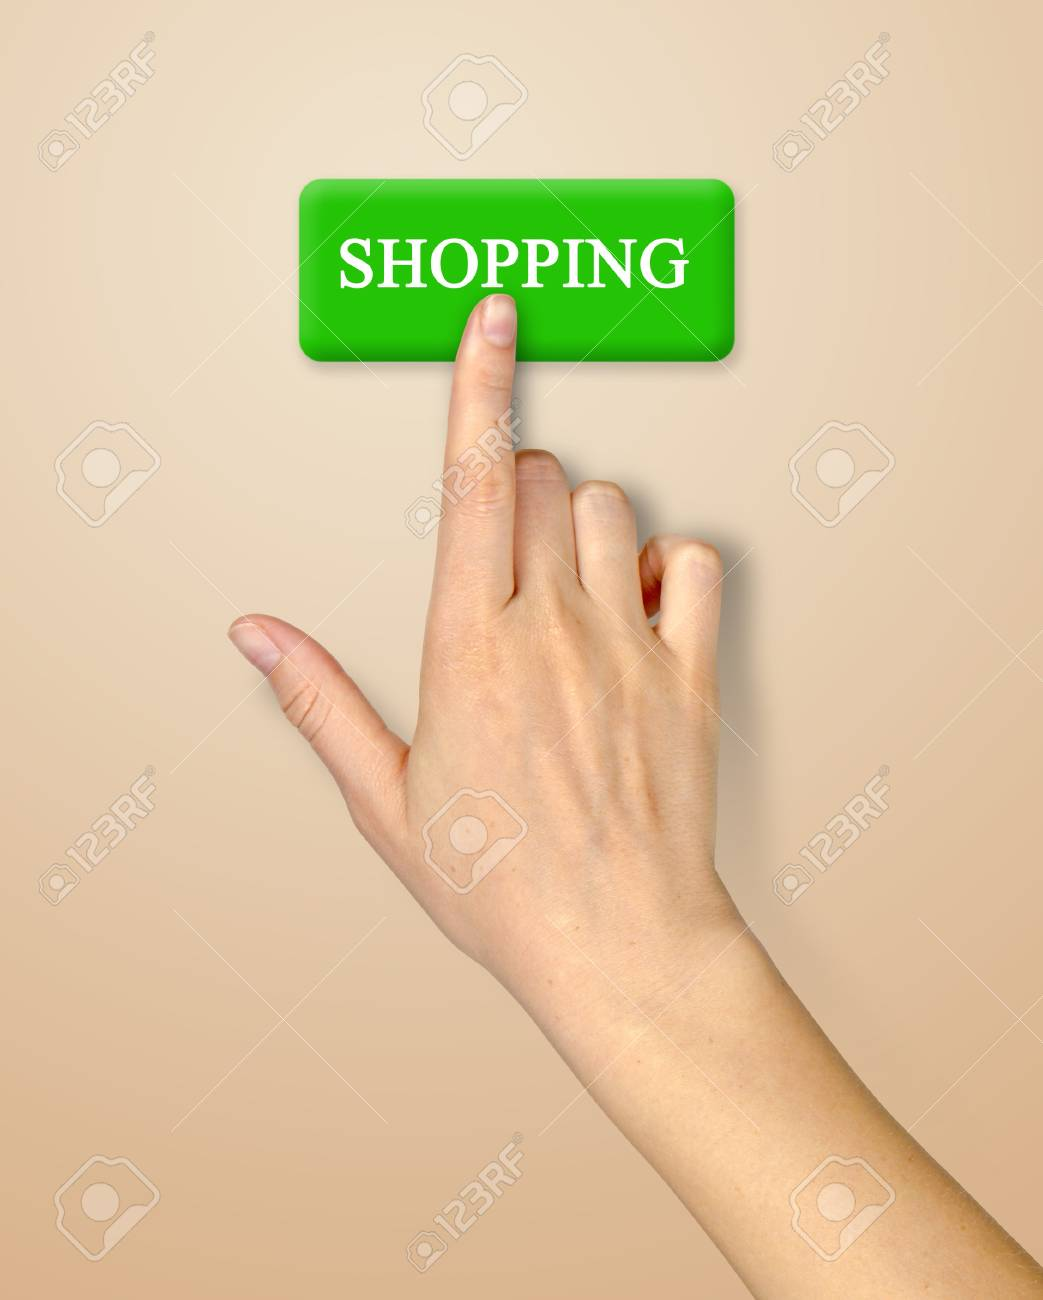 Button for shopping Stock Photo - 16676250